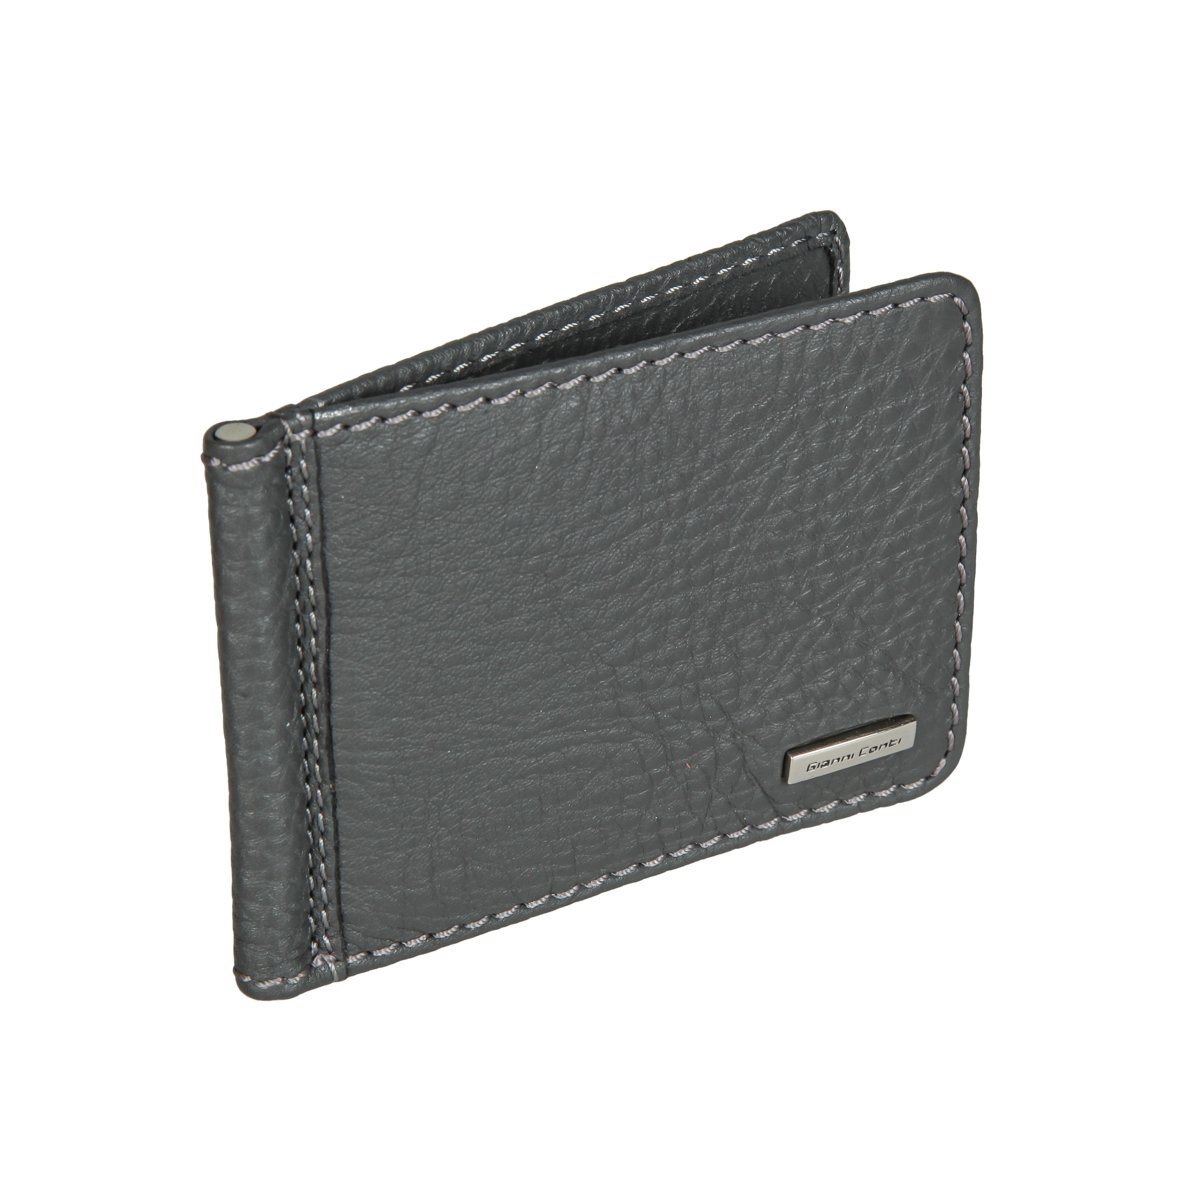 Money clip Gianni Conti 9517034 dark gray edcgear abs double sides slim money clip card holder